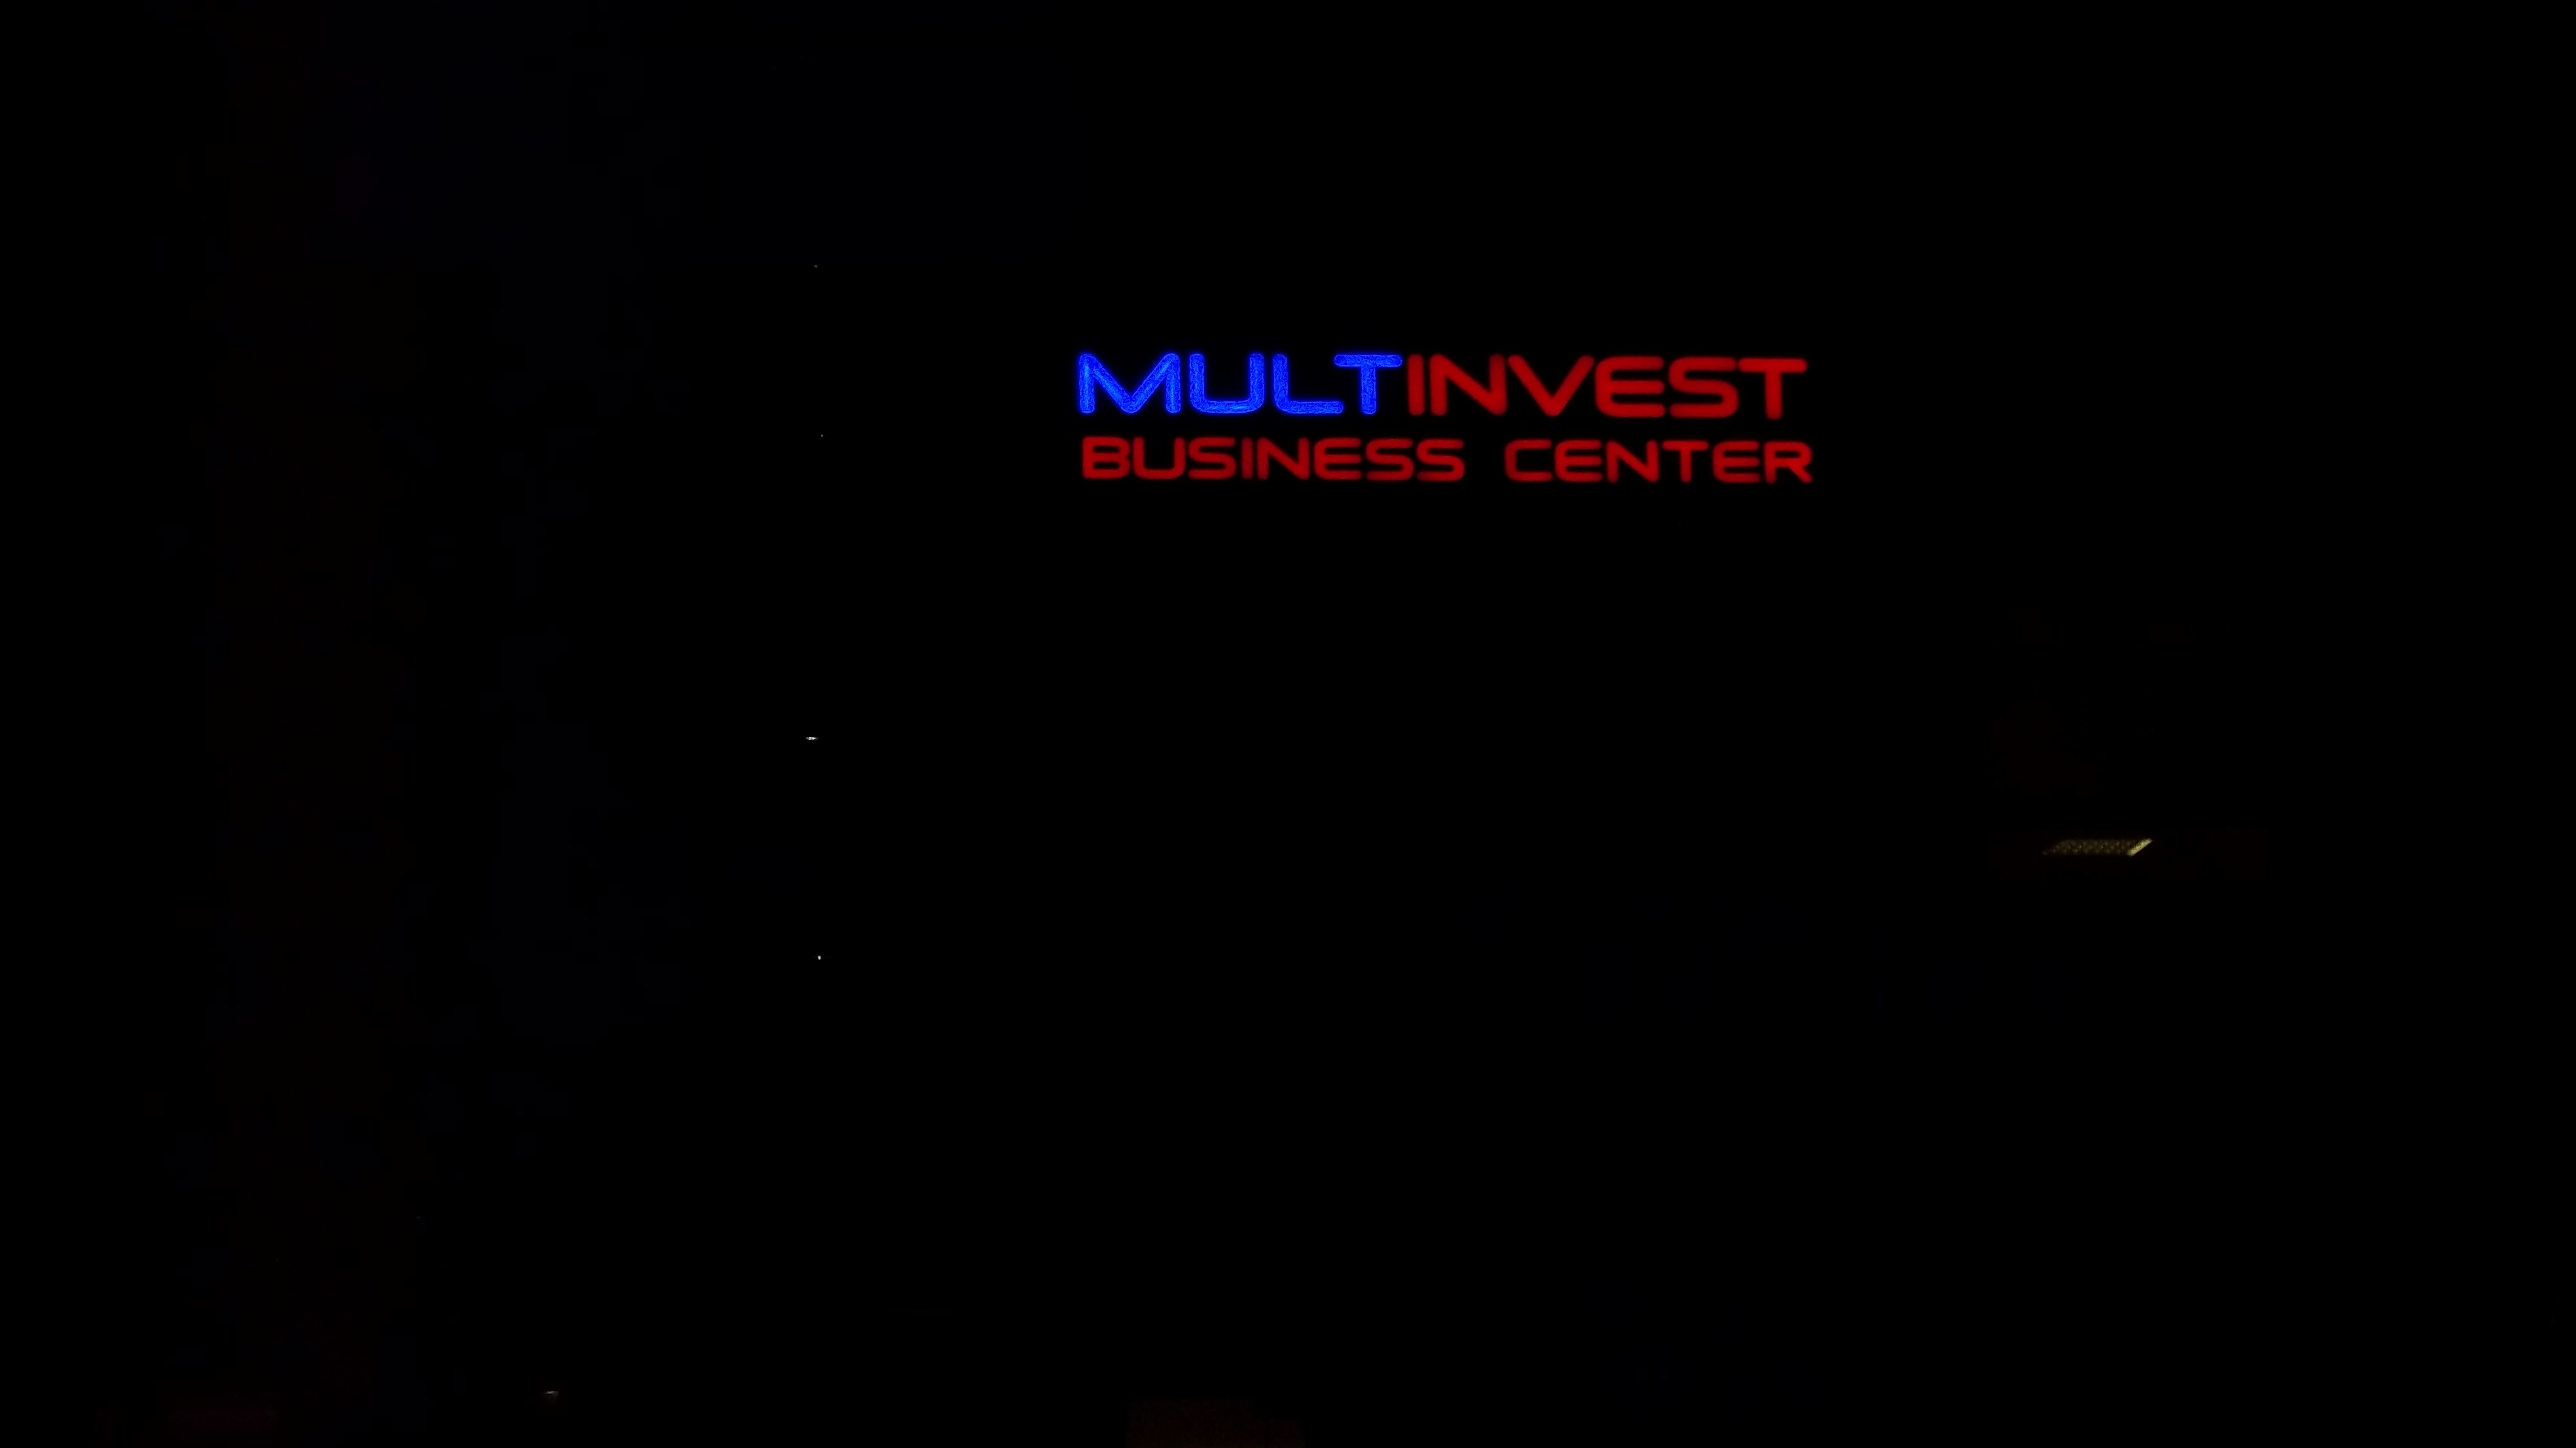 LITERE VOLUMETRICE LUMINOASE Multinvest (2)